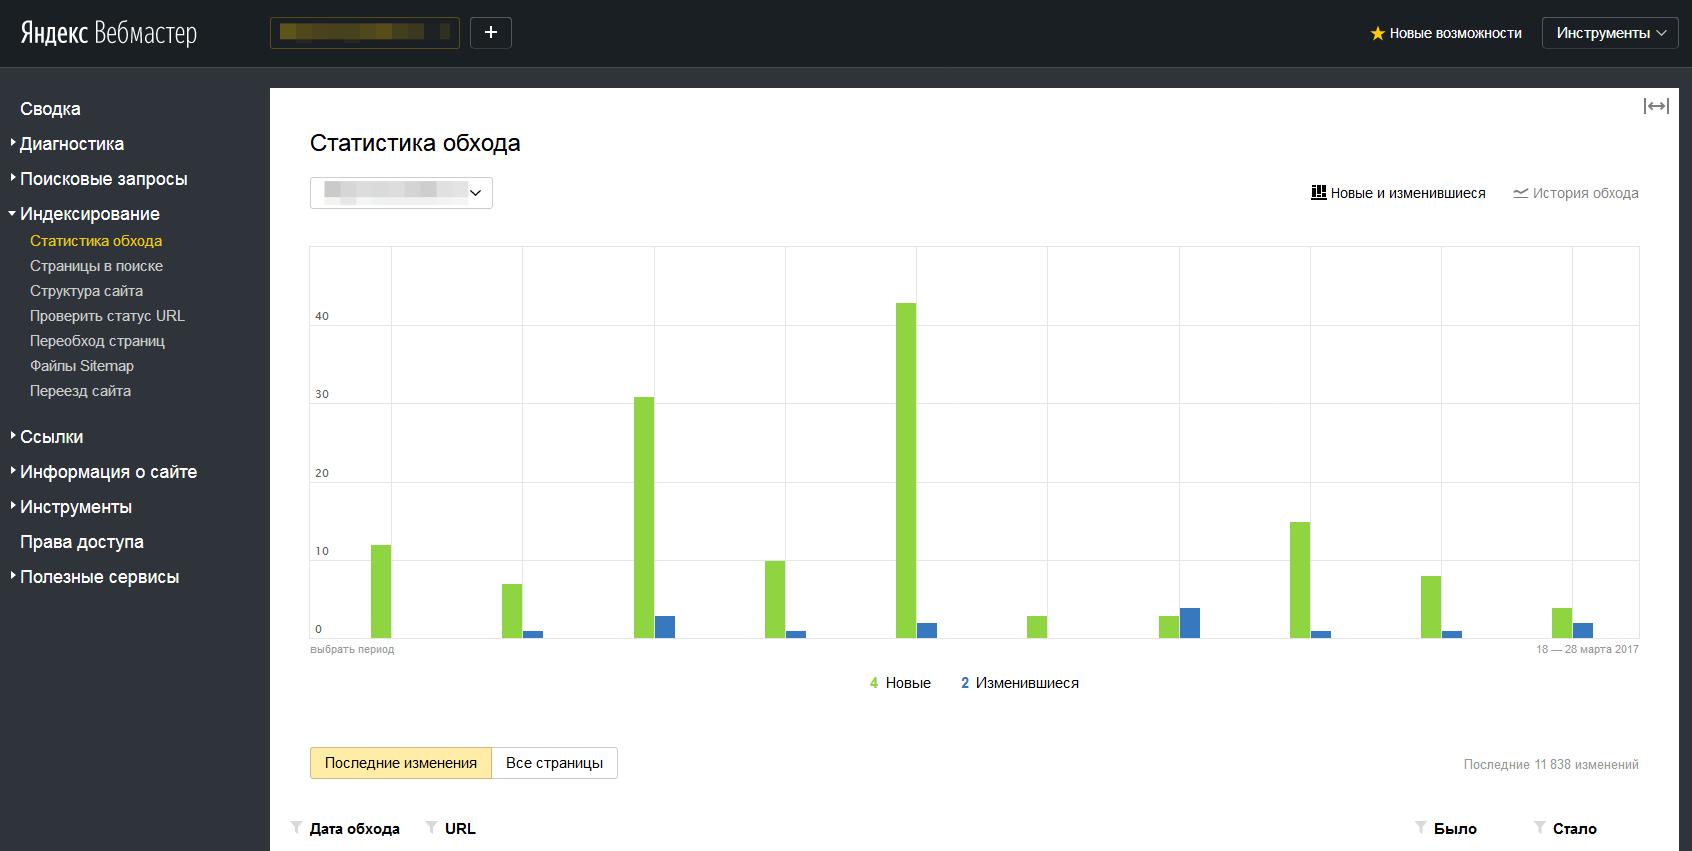 Яндекс.Вебмастер стал чаще обновлять статистику обхода